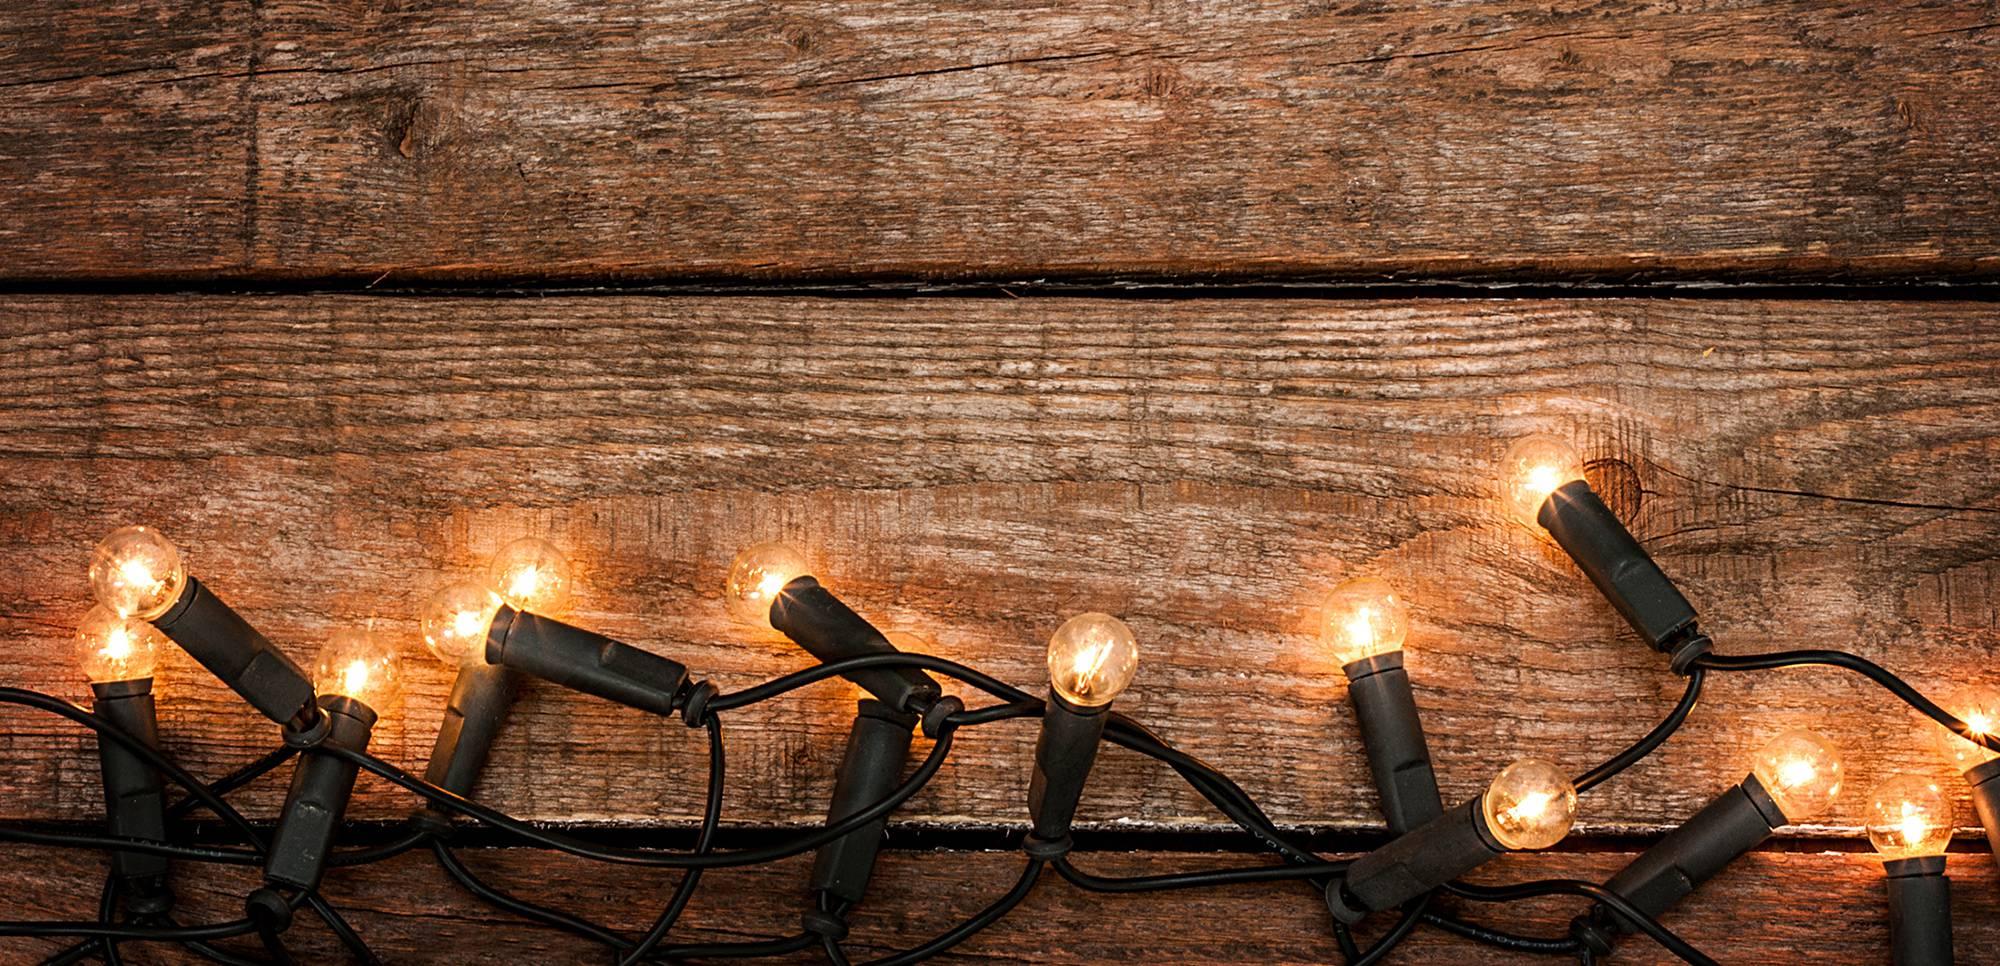 Christmas lights - sharing Christmas facts across the world